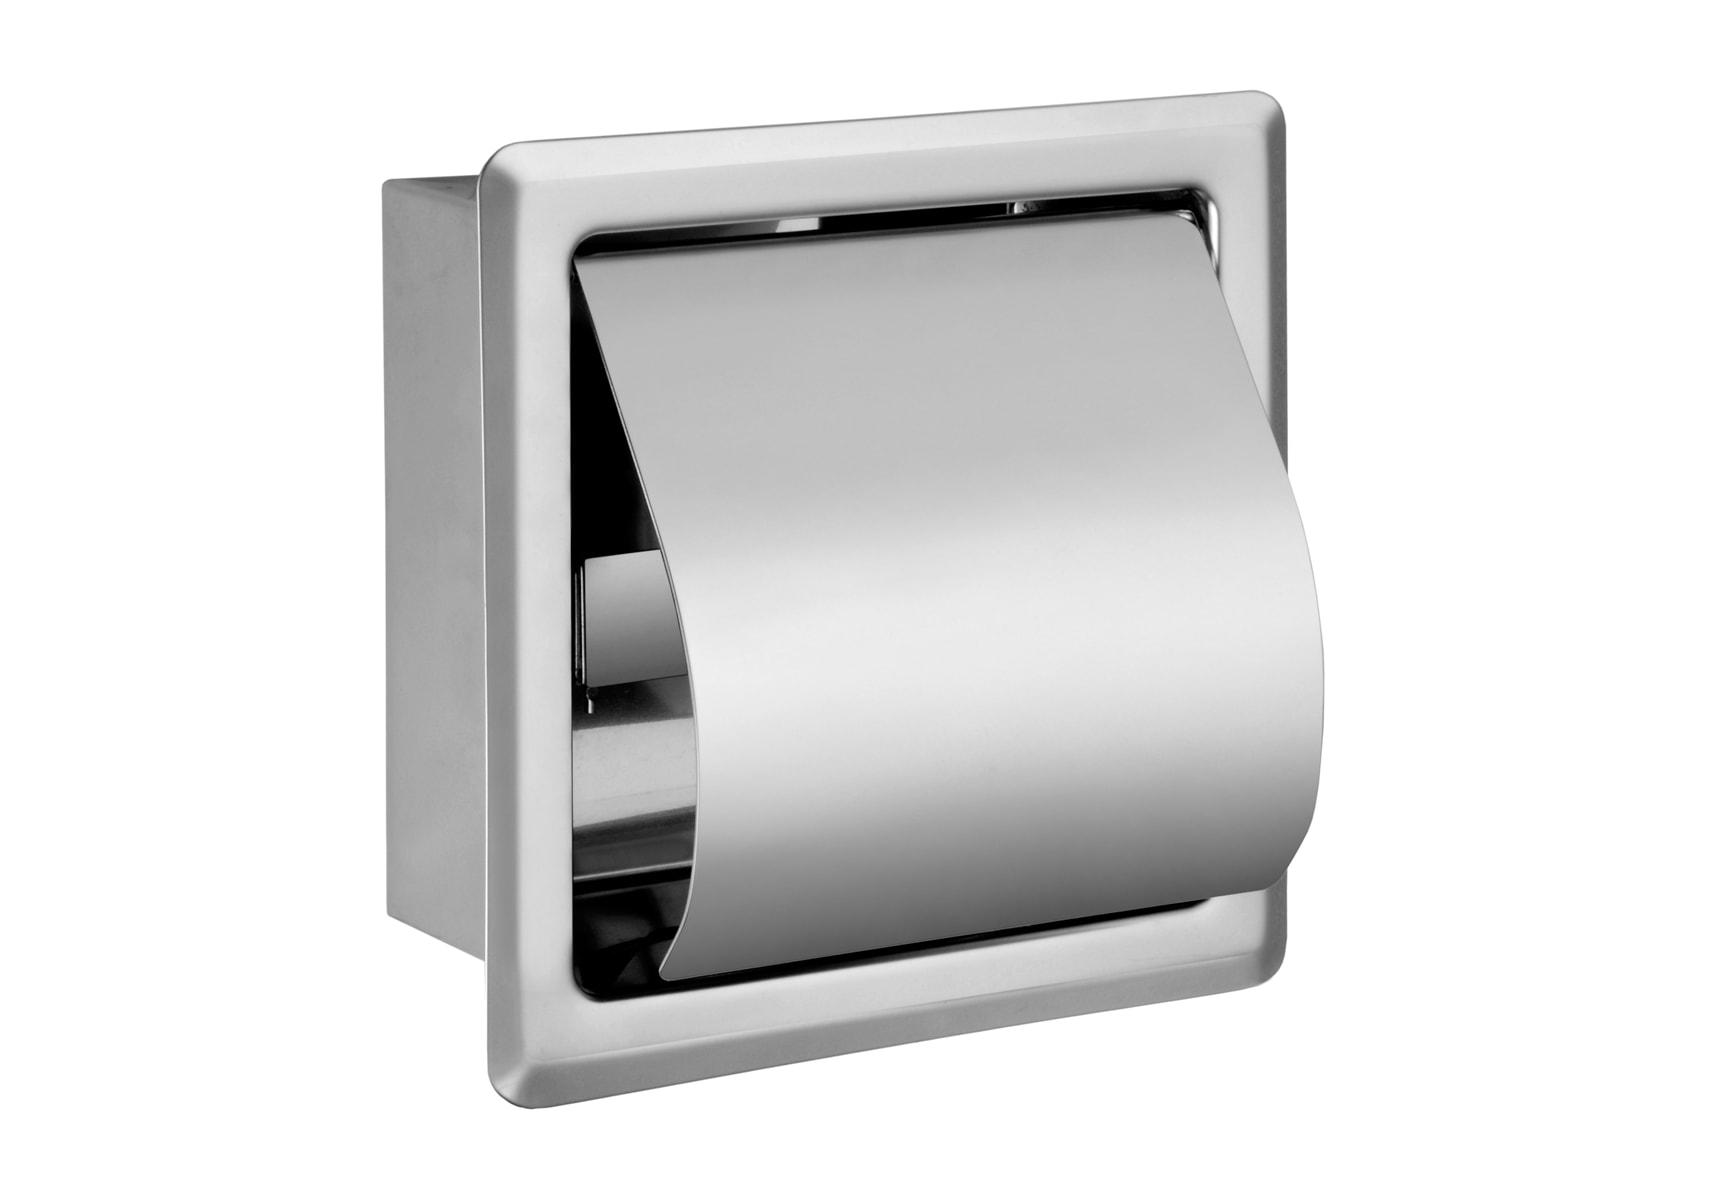 Arkitekt Built-in Roll Holder (Single)